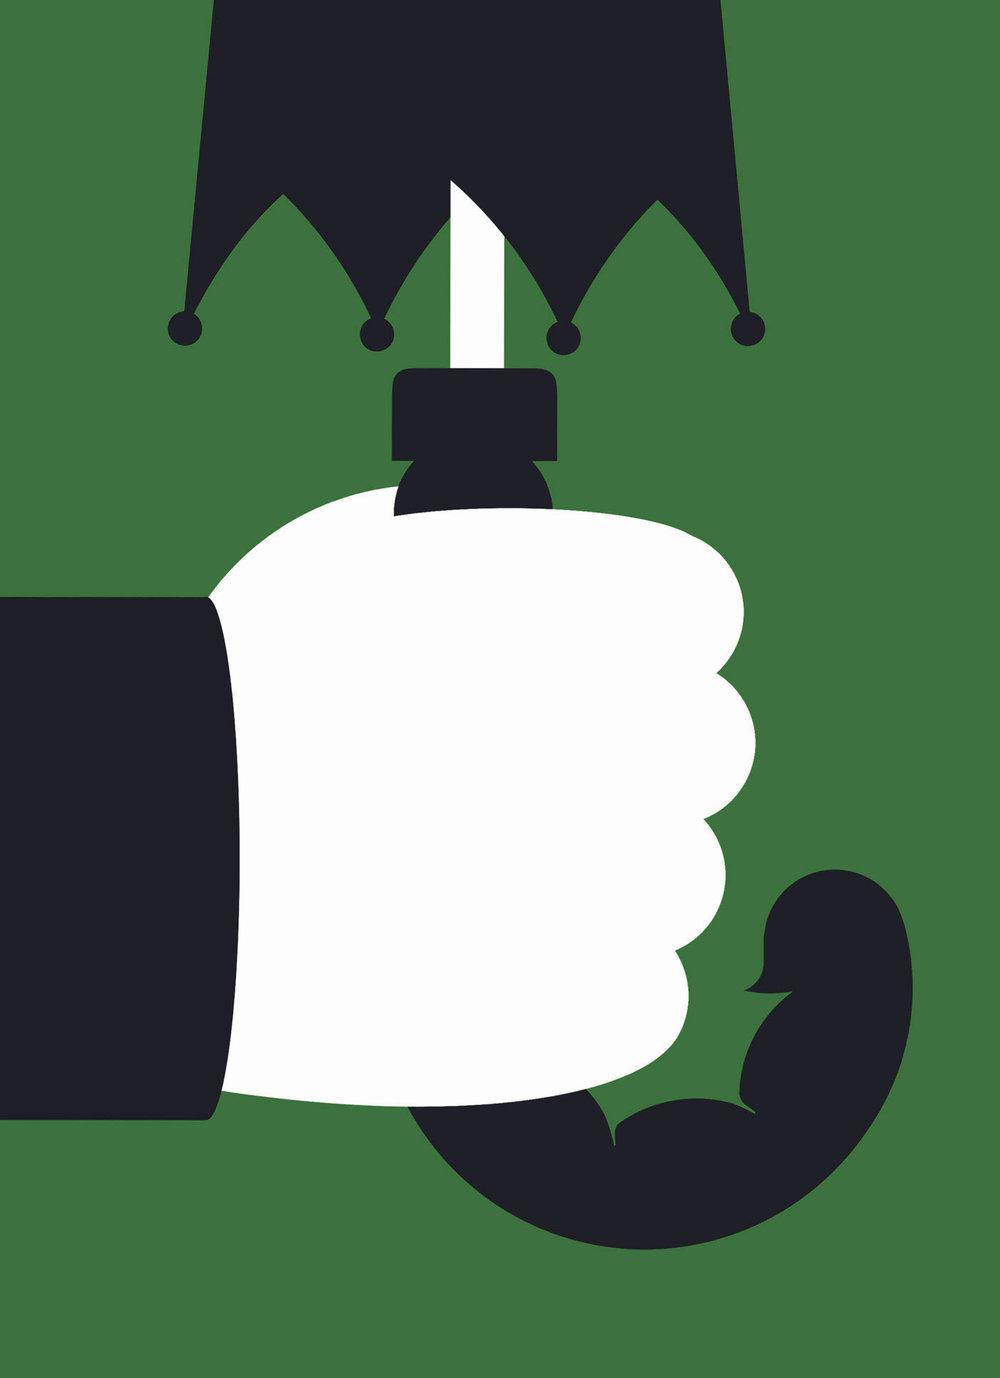 Kleinwort Benson - Illustration for an article entitled